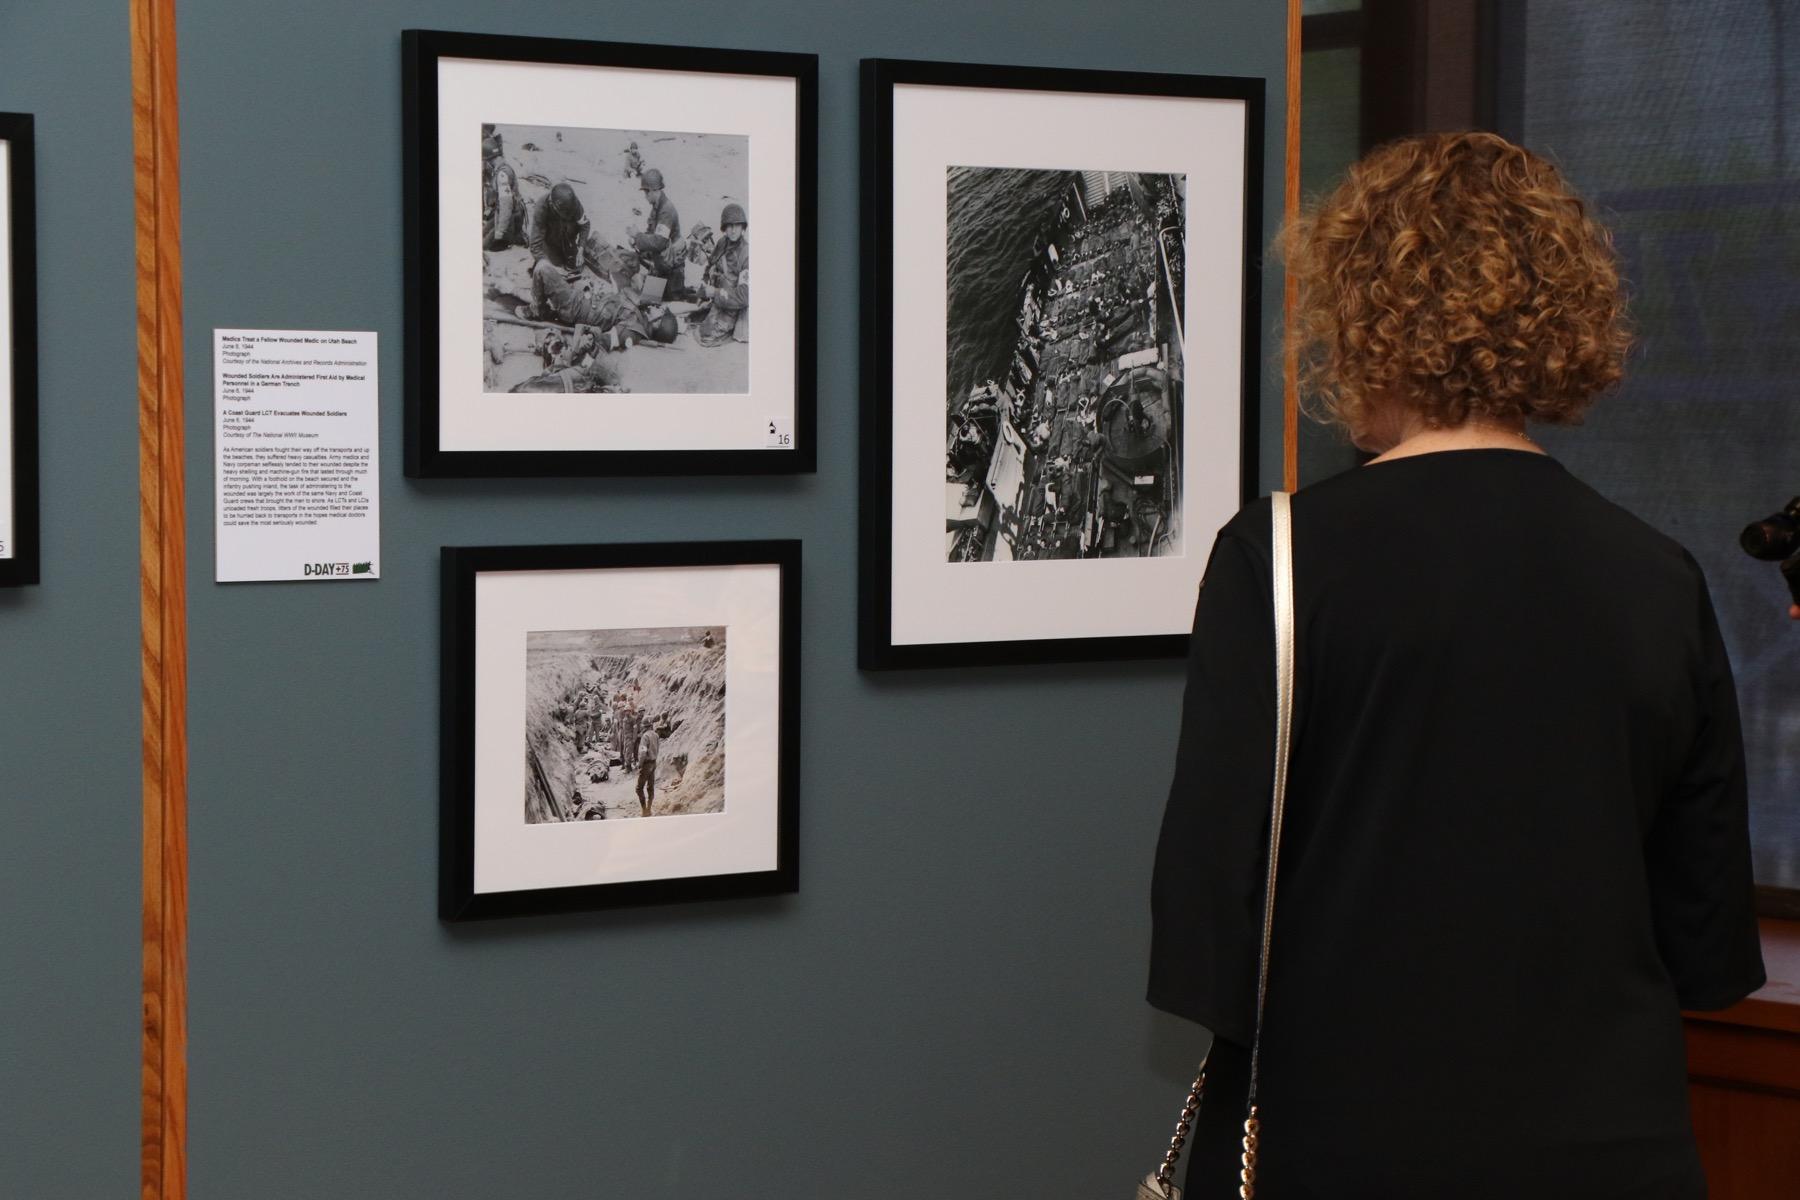 D-Day +75 Exhibit